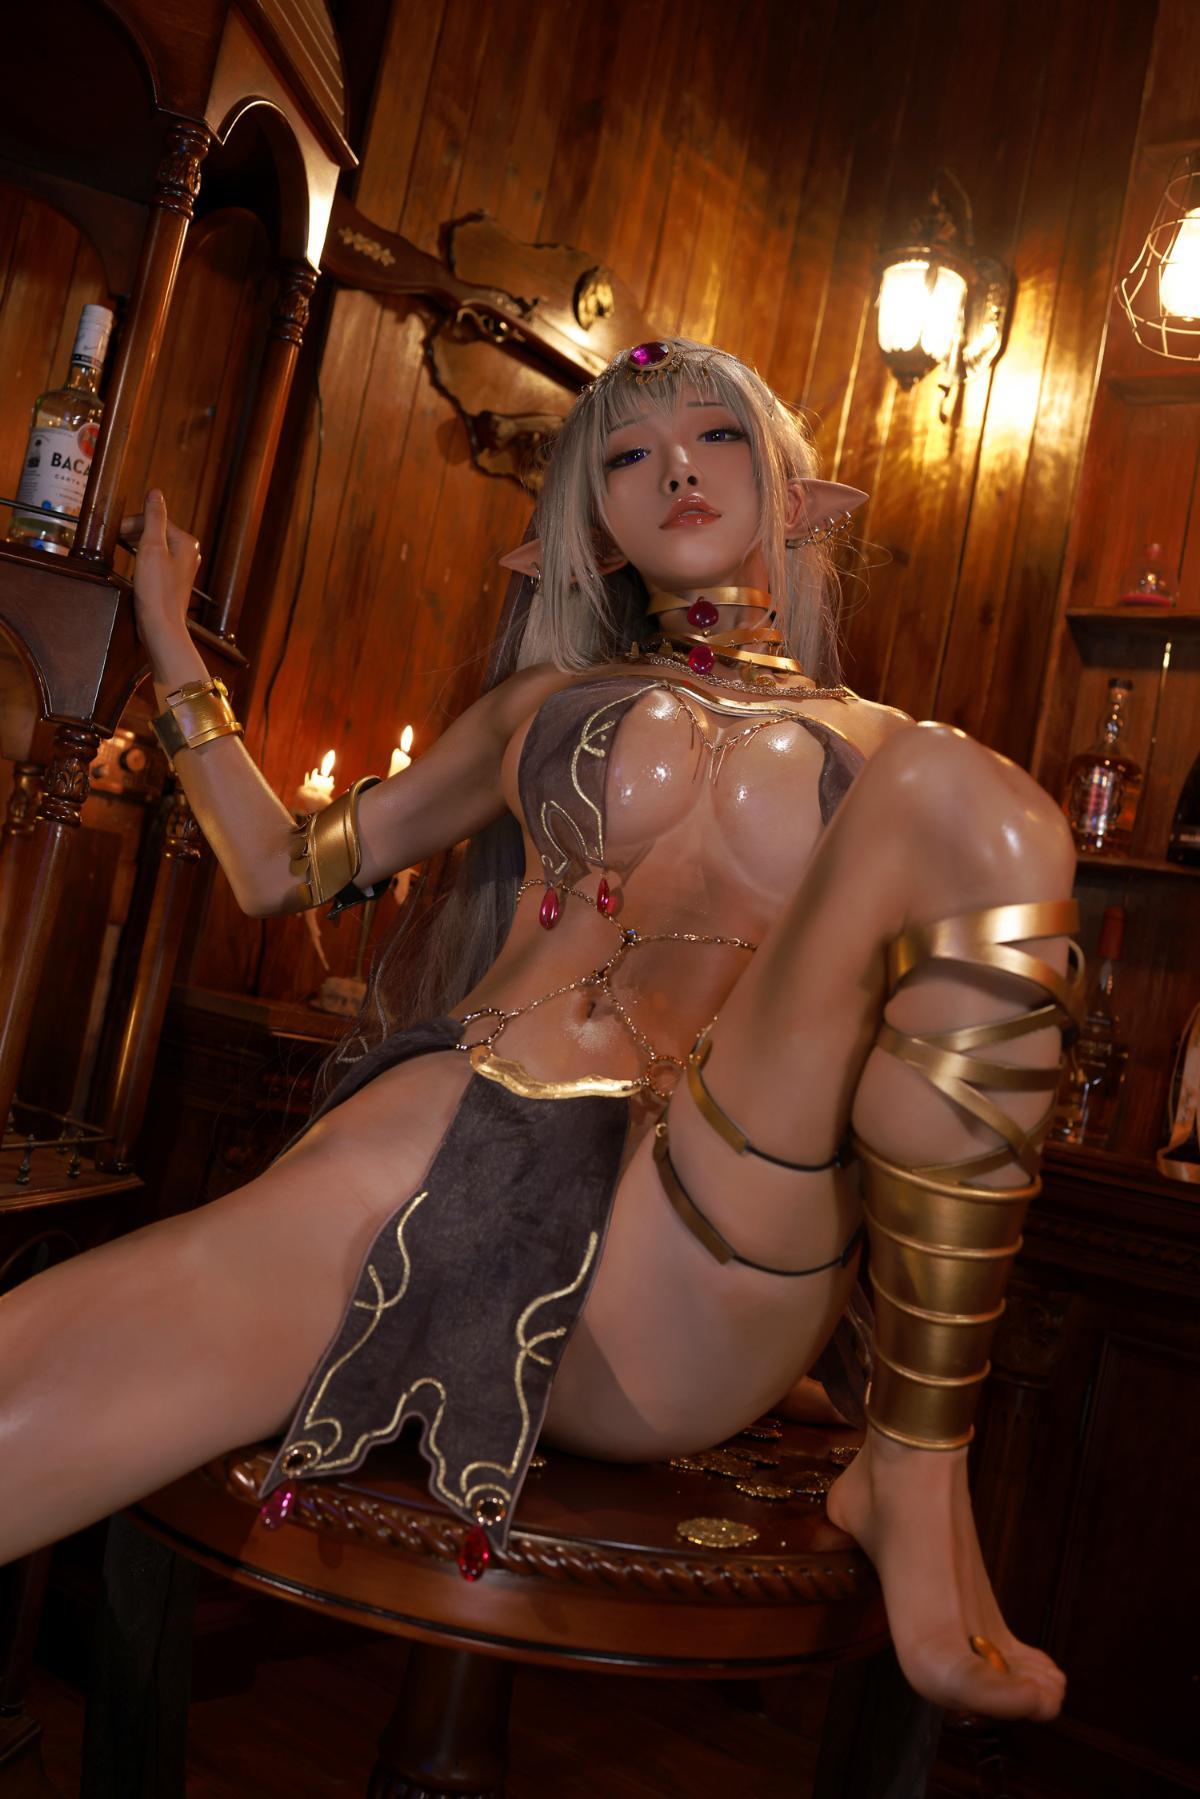 Tan Dancer Elf Succubus Cosplay by Aqua 23